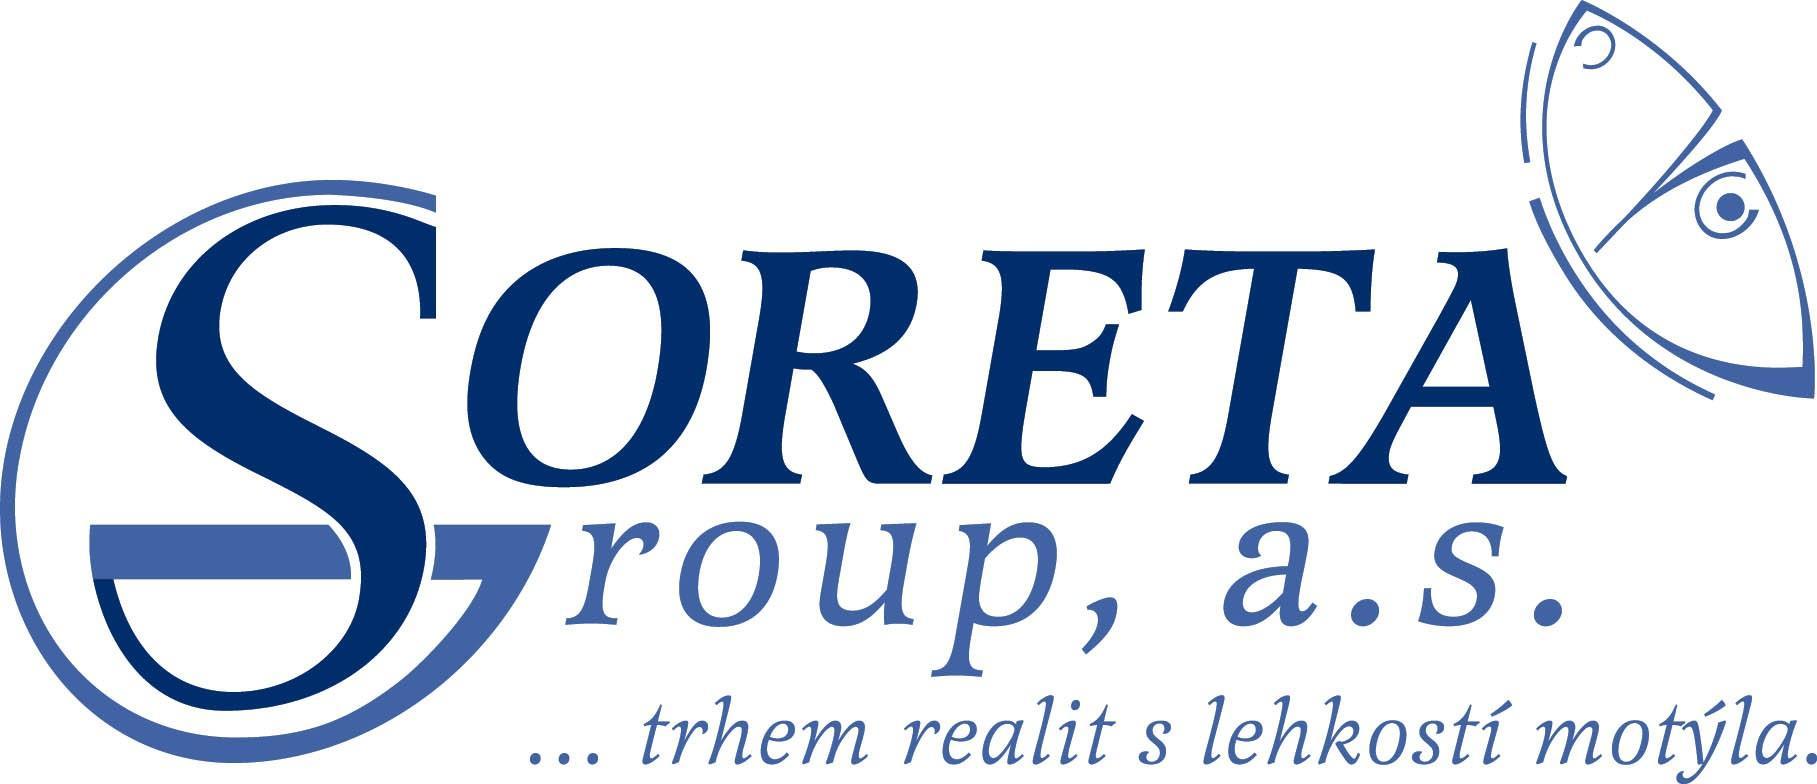 SORETA Group, a.s.